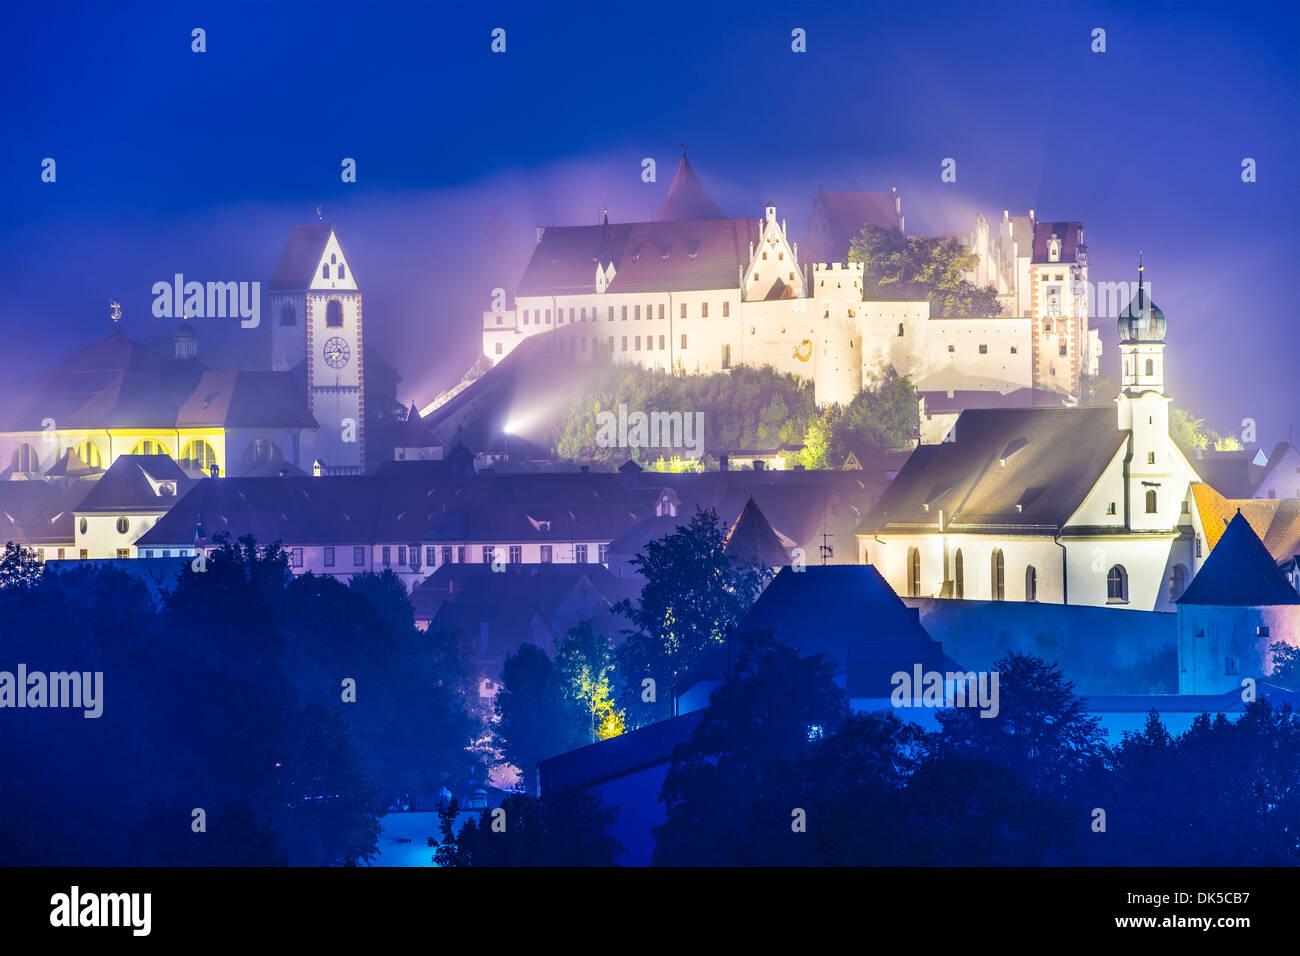 Misty night in Fussen, Germany. - Stock Image